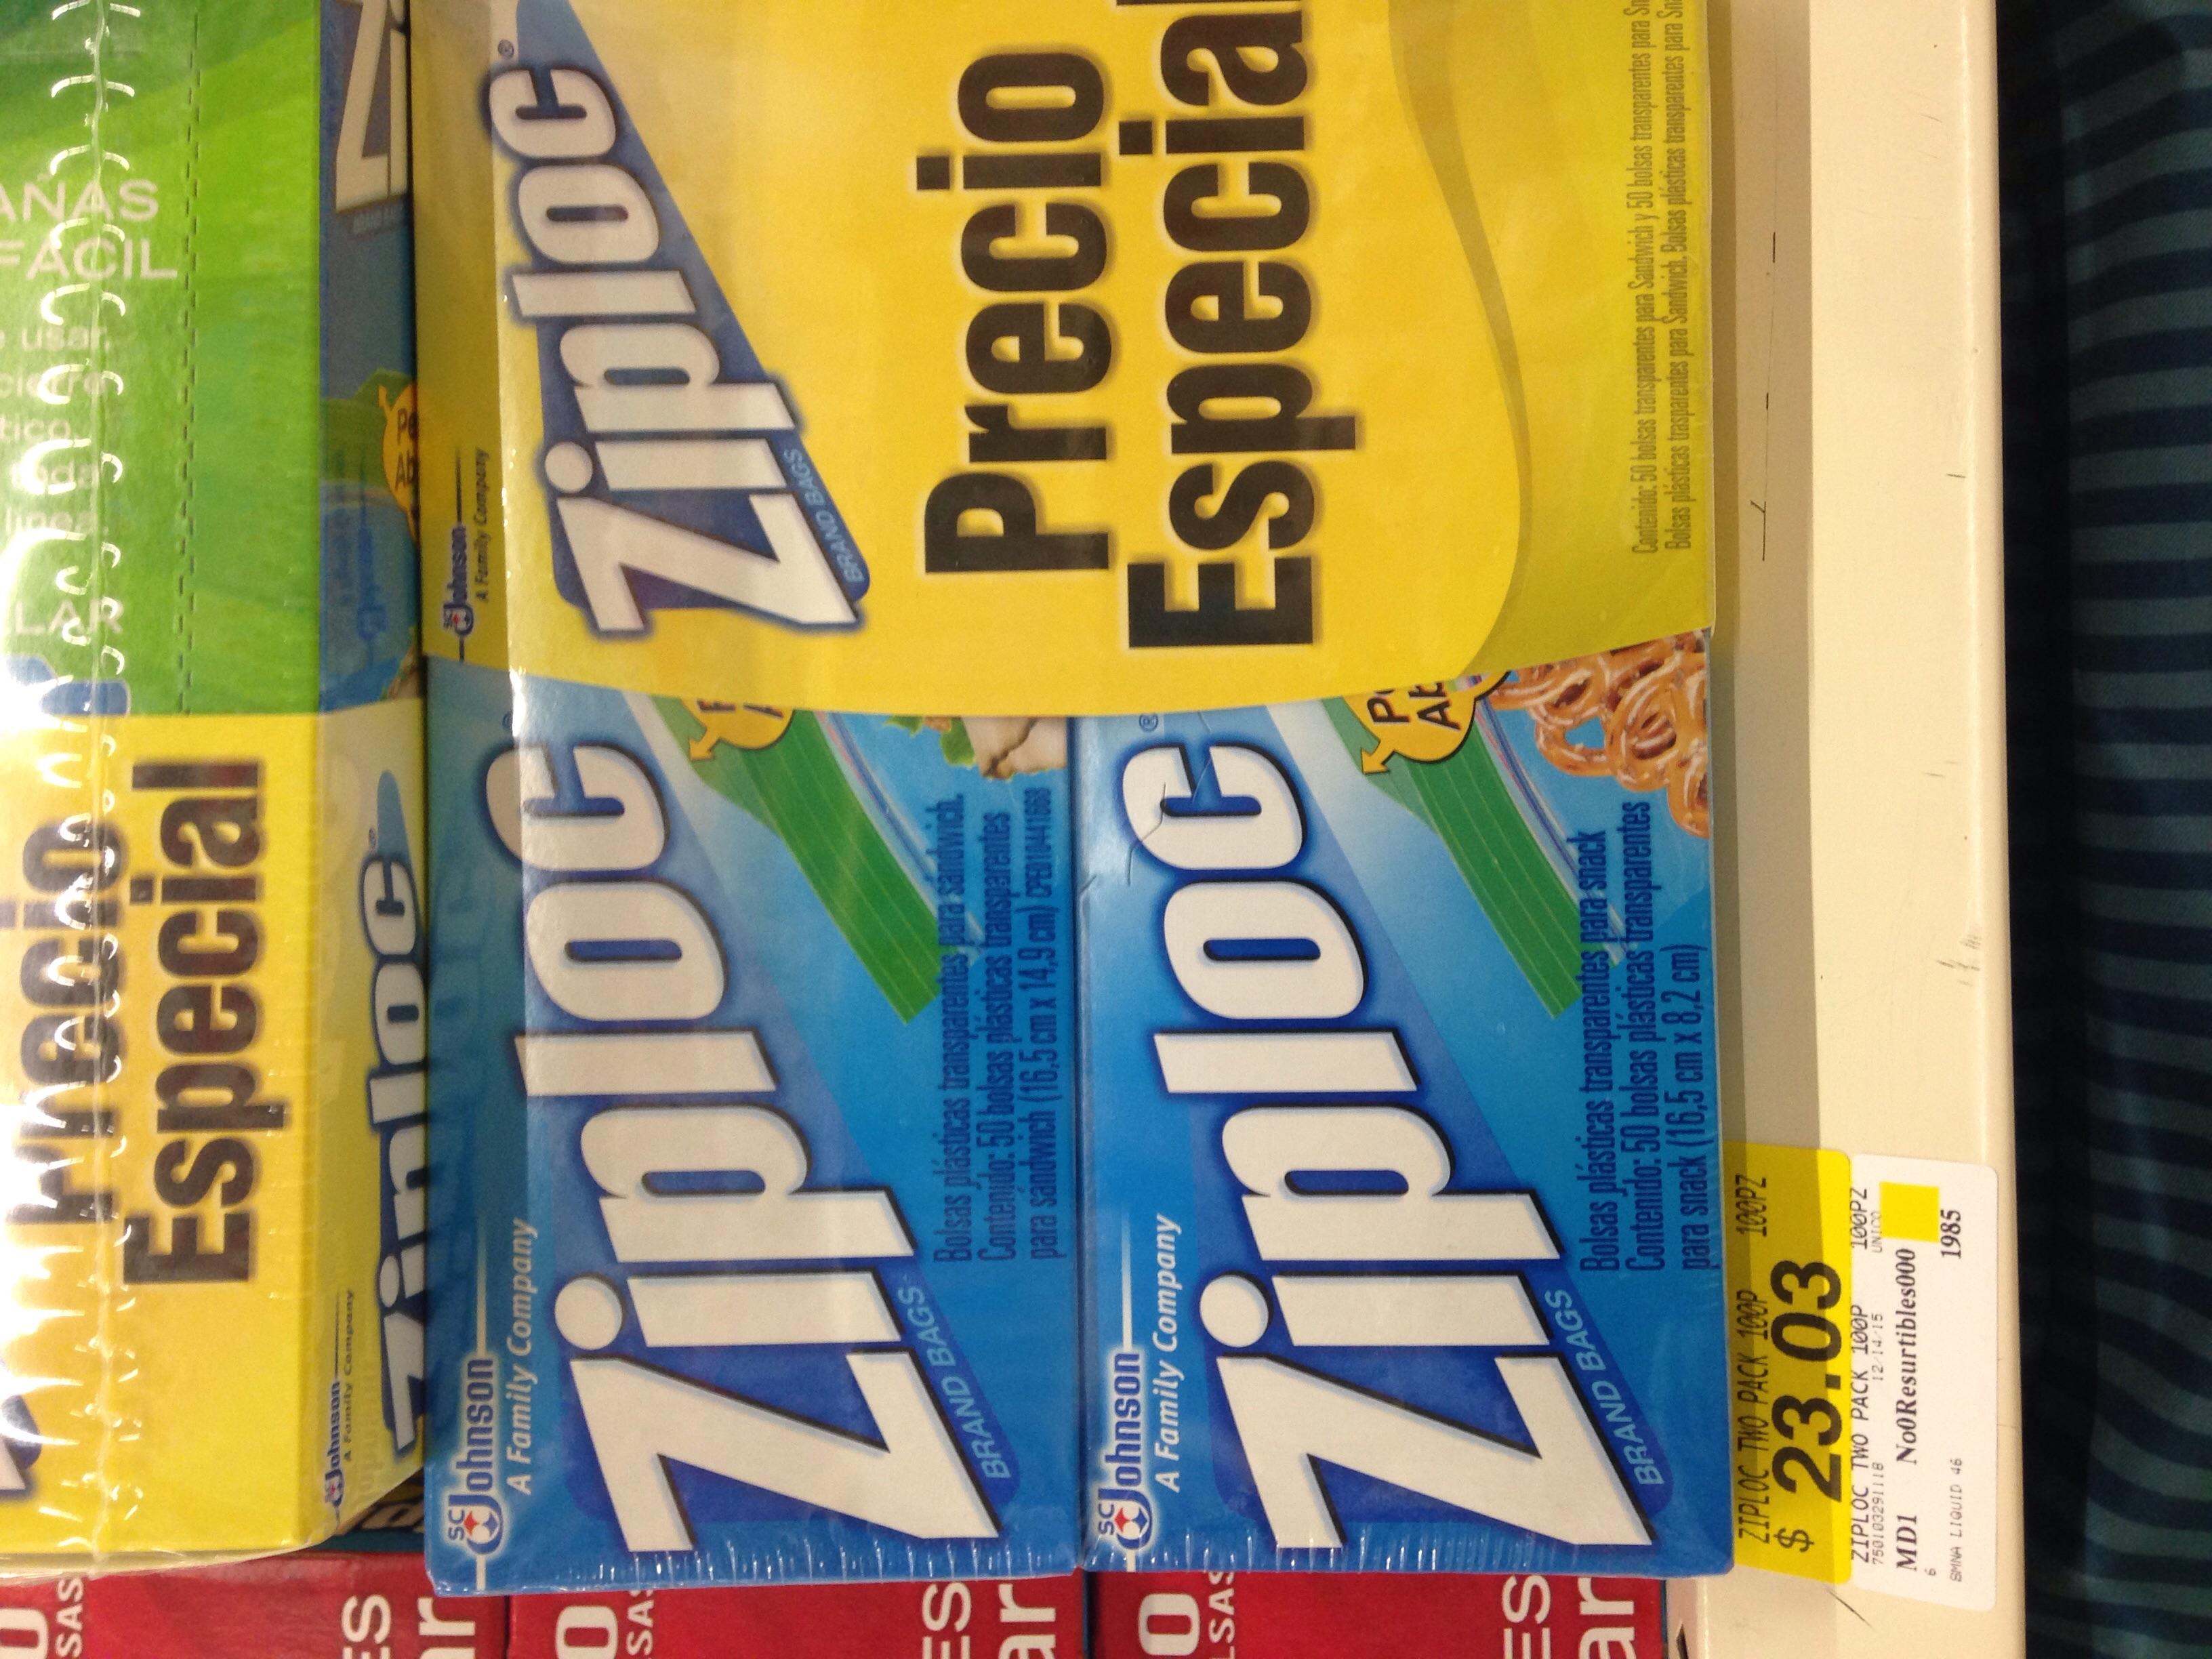 Walmart: liquidacion bolsas ziploc, aromatizantes de temporada